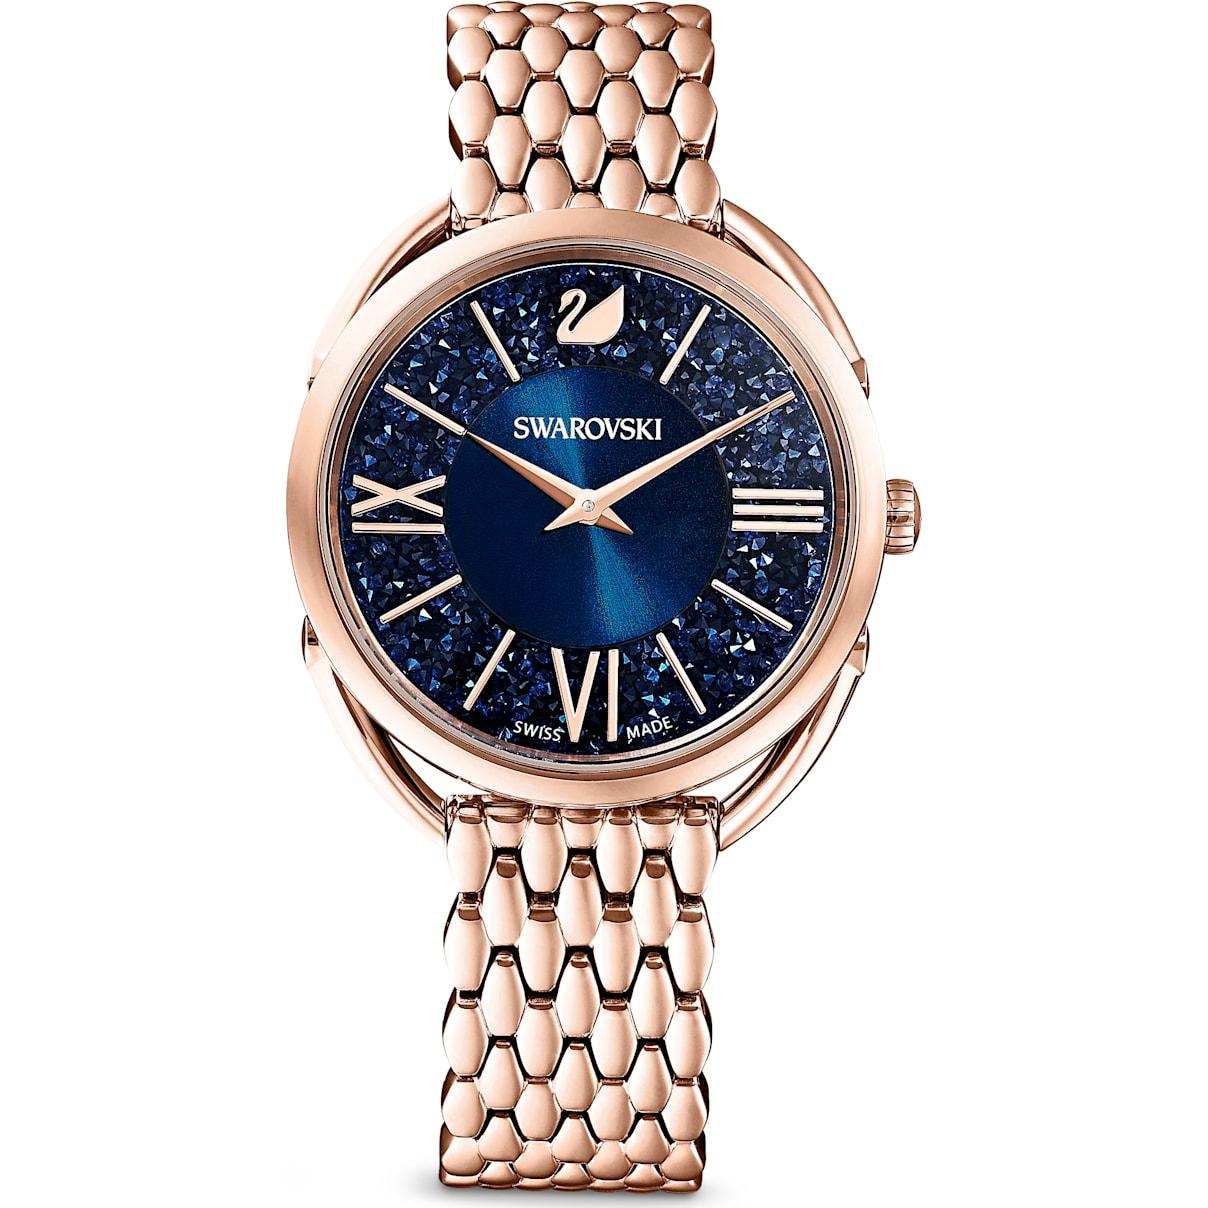 Swarovski Crystalline Glam Watch, Metal Bracelet, Blue, Rose-gold tone PVD